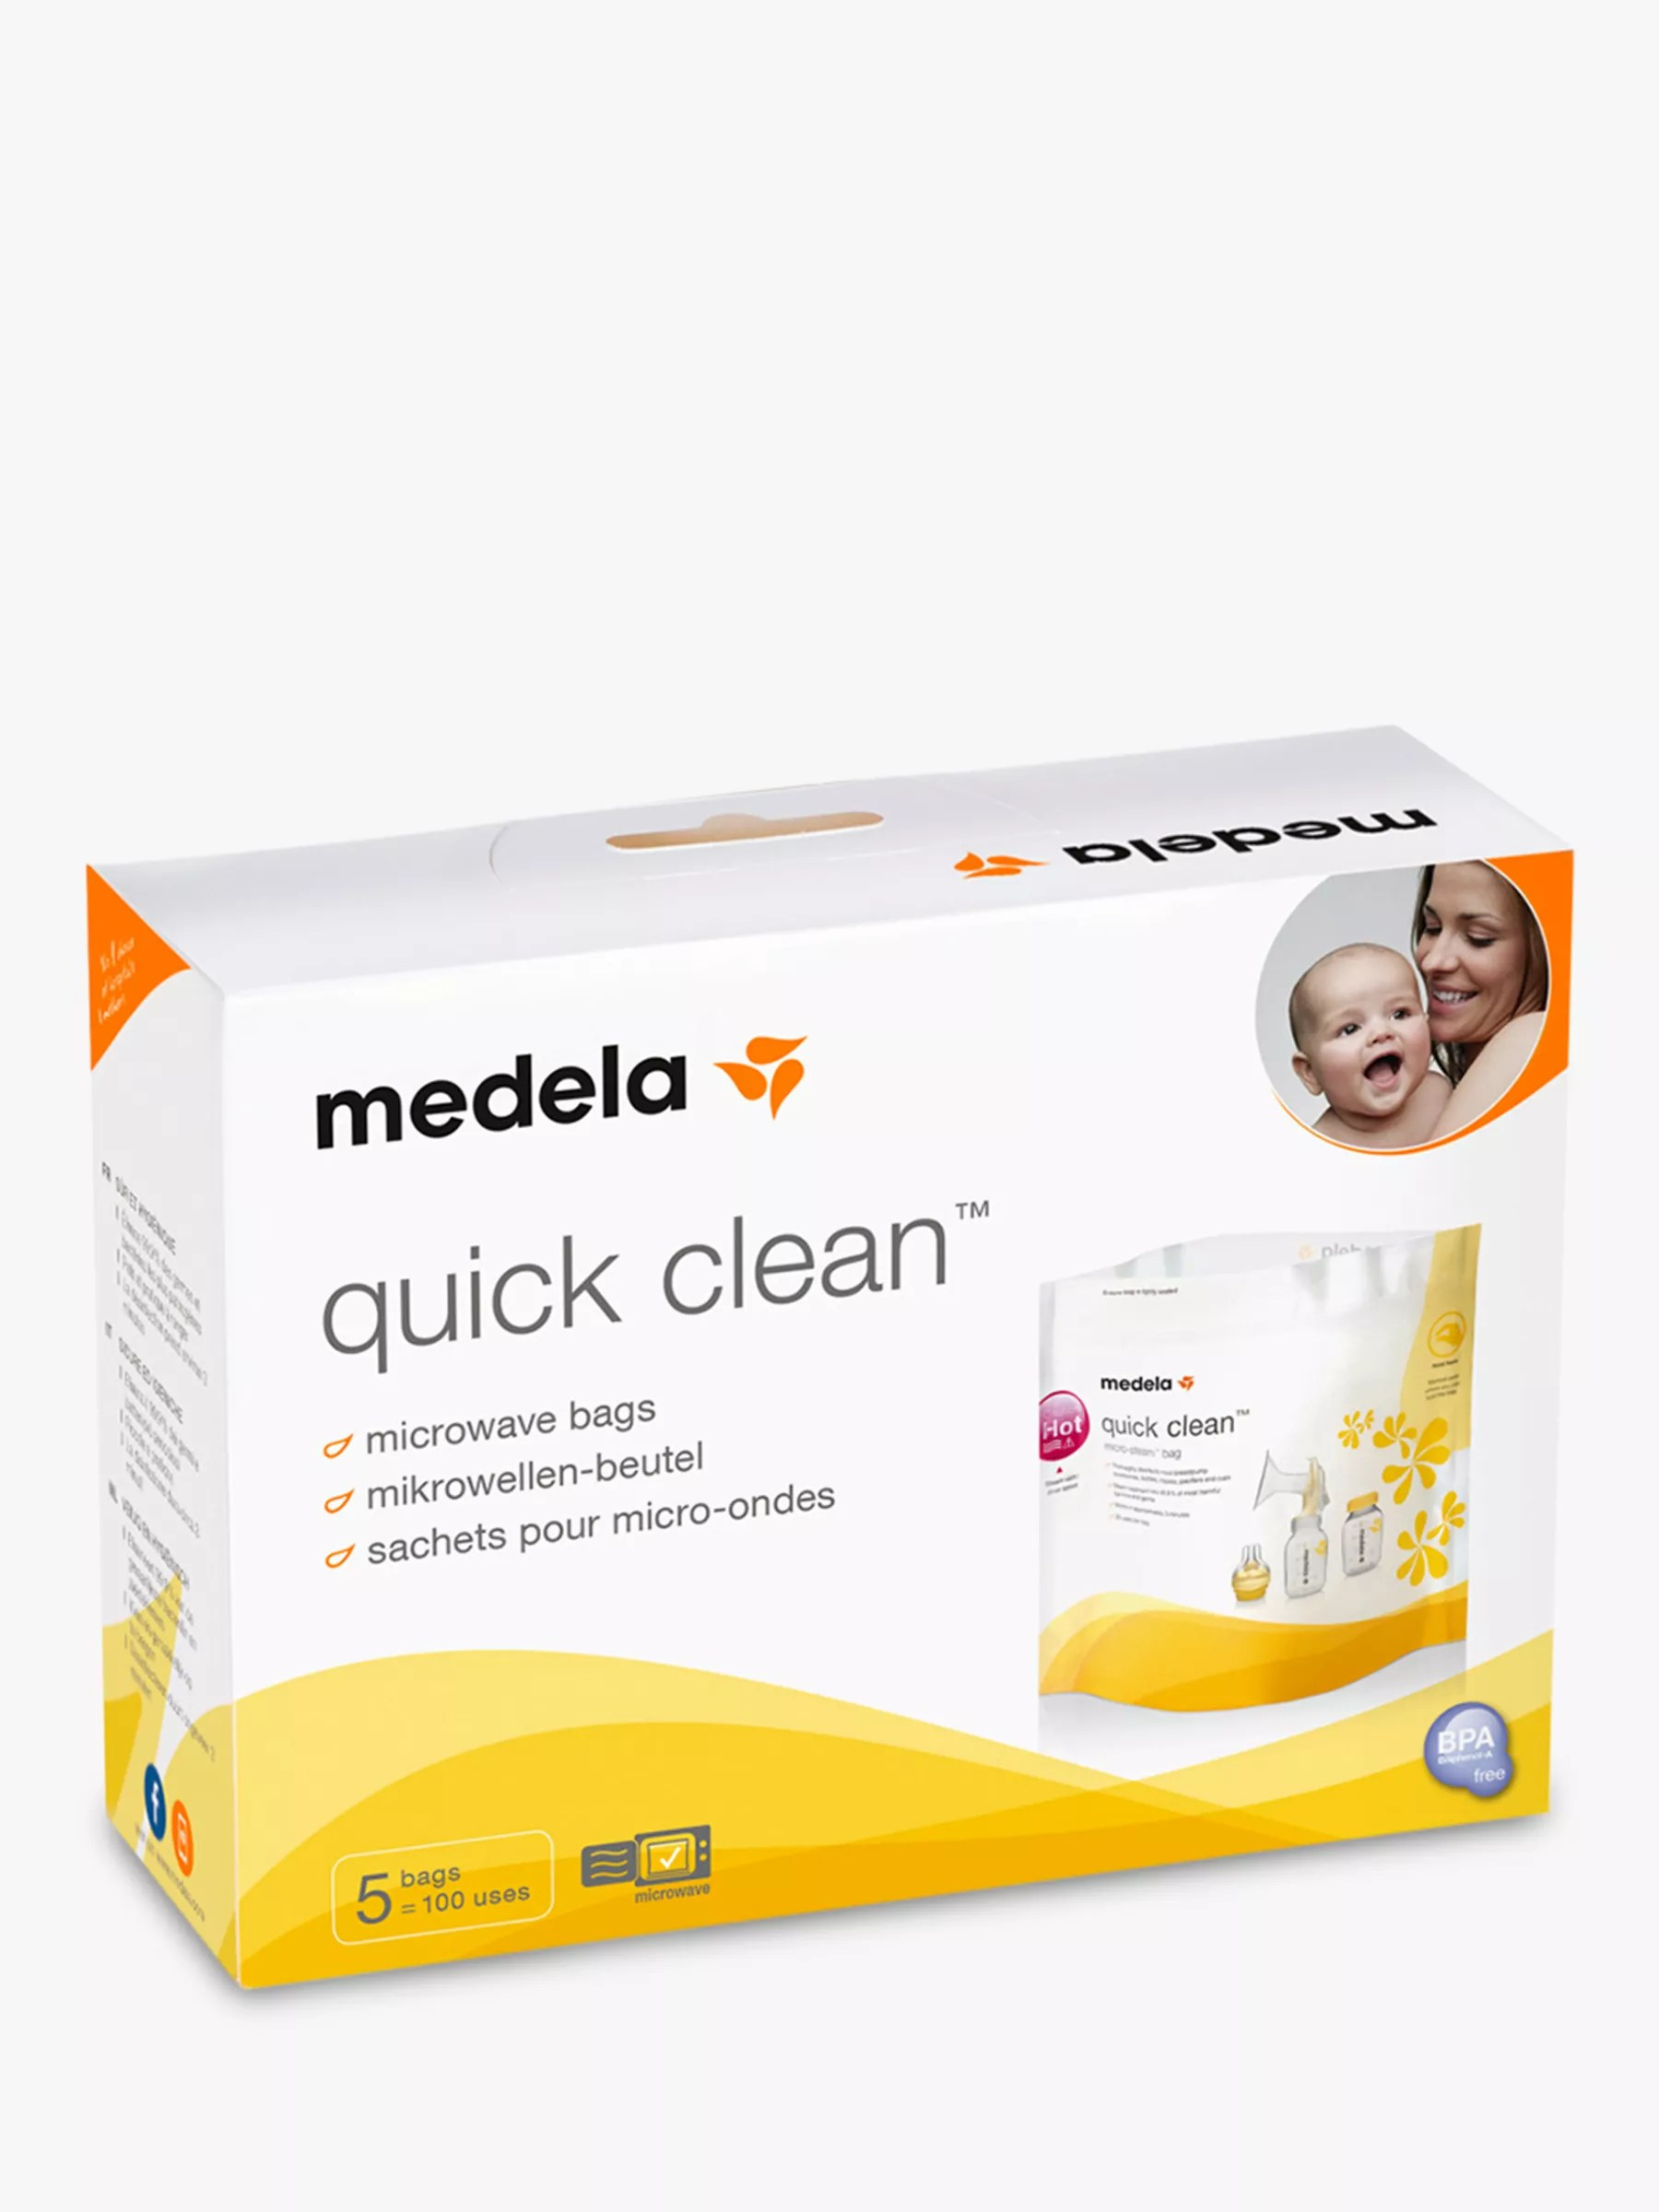 medela quick clean microwave bags pack of 5